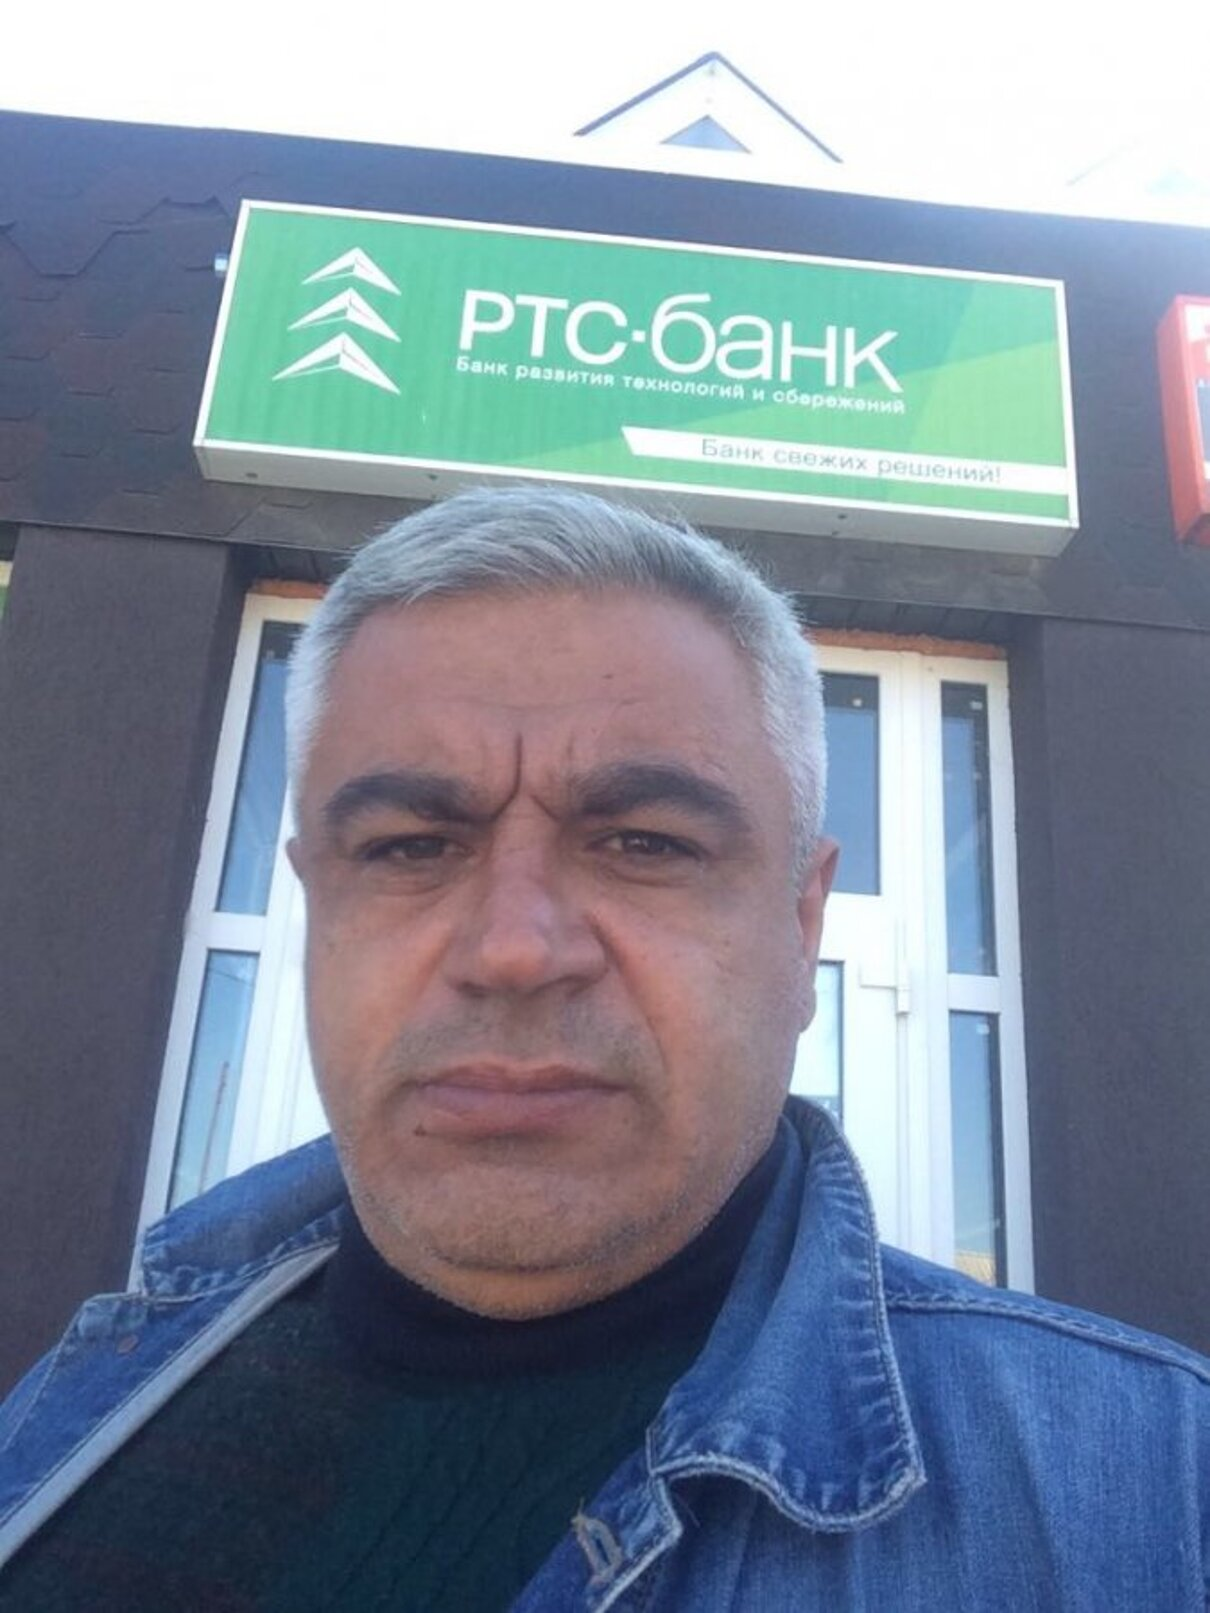 Жалоба-отзыв: Джафаров Аббас Джафарович - Мошенник.  Фото №2